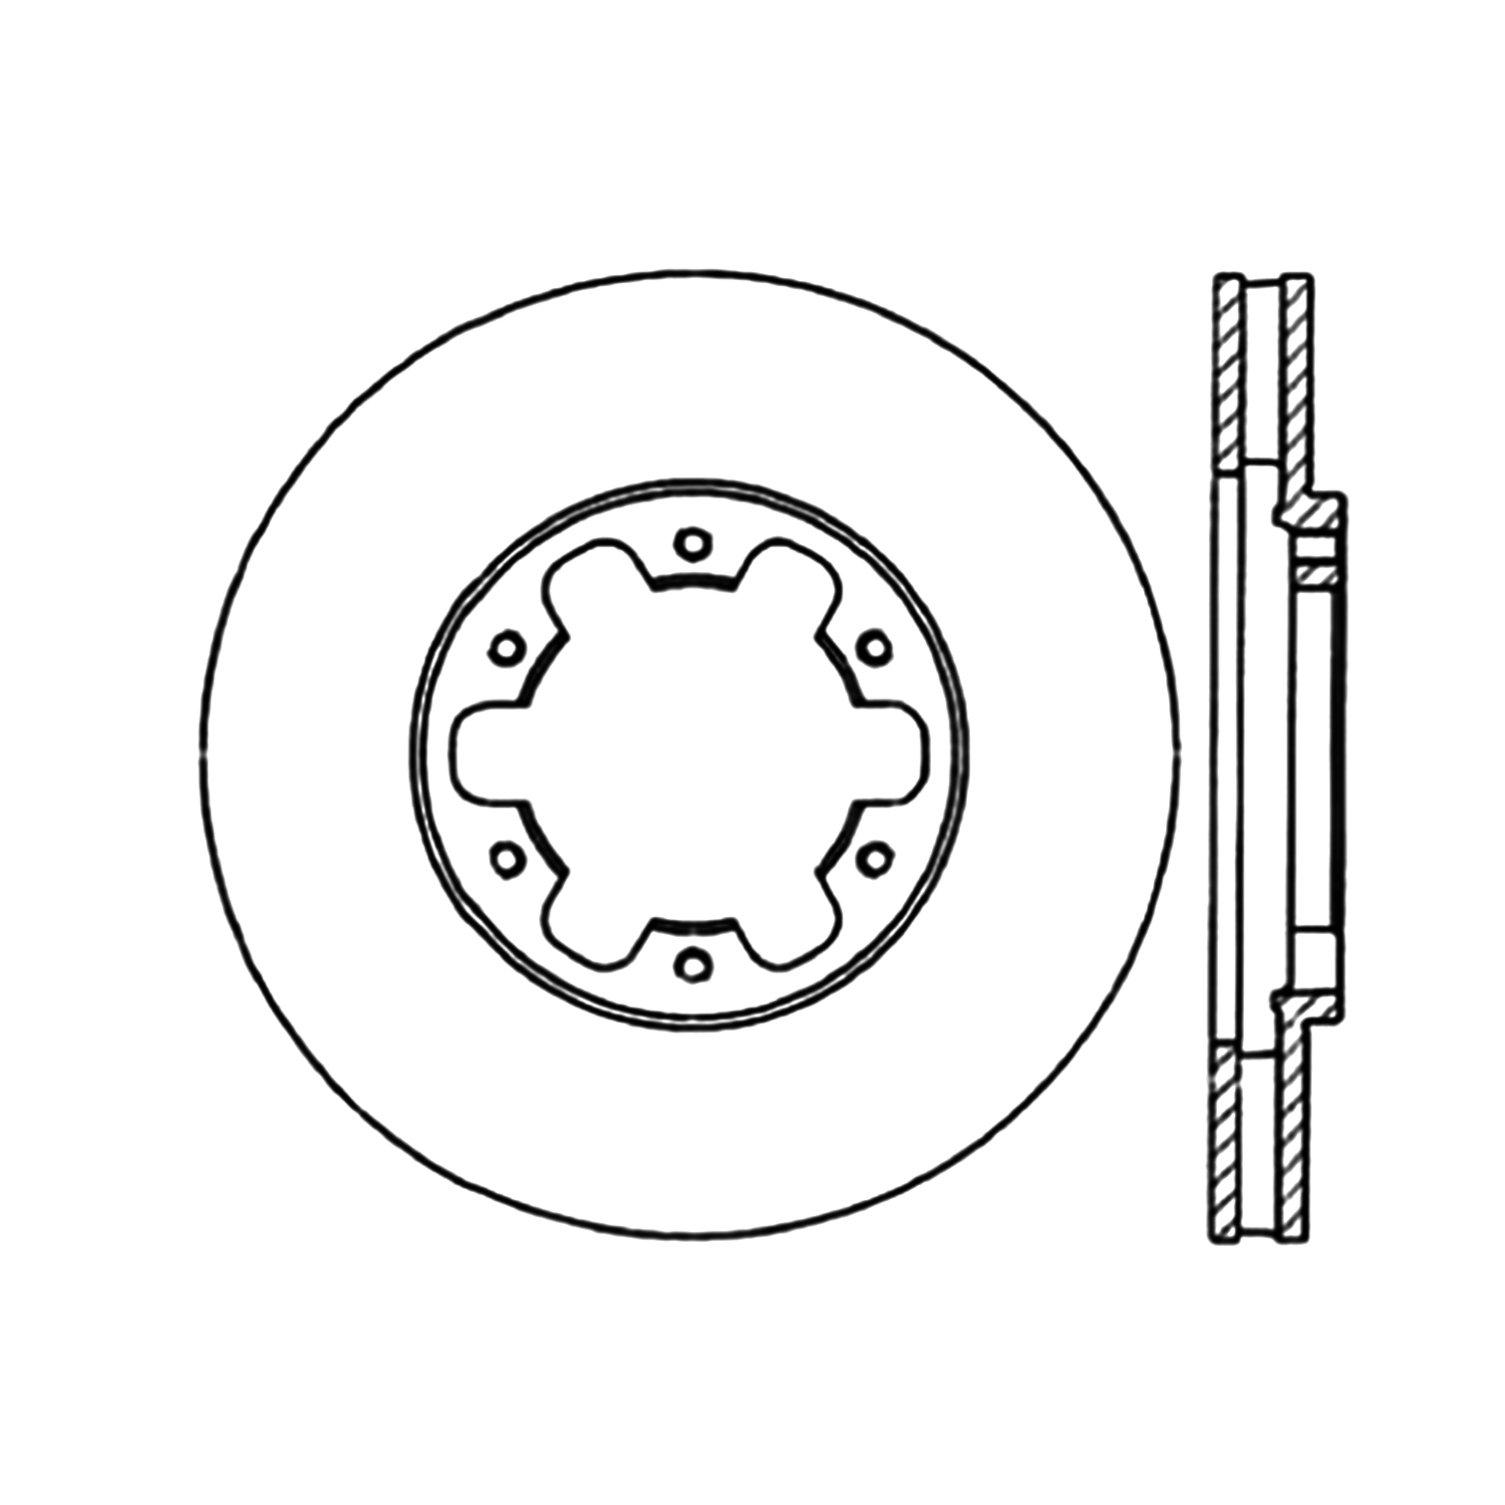 2004 nissan frontier disc brake rotor autopartskart Nissan Pickup 2004 nissan frontier disc brake rotor ce 120 42063